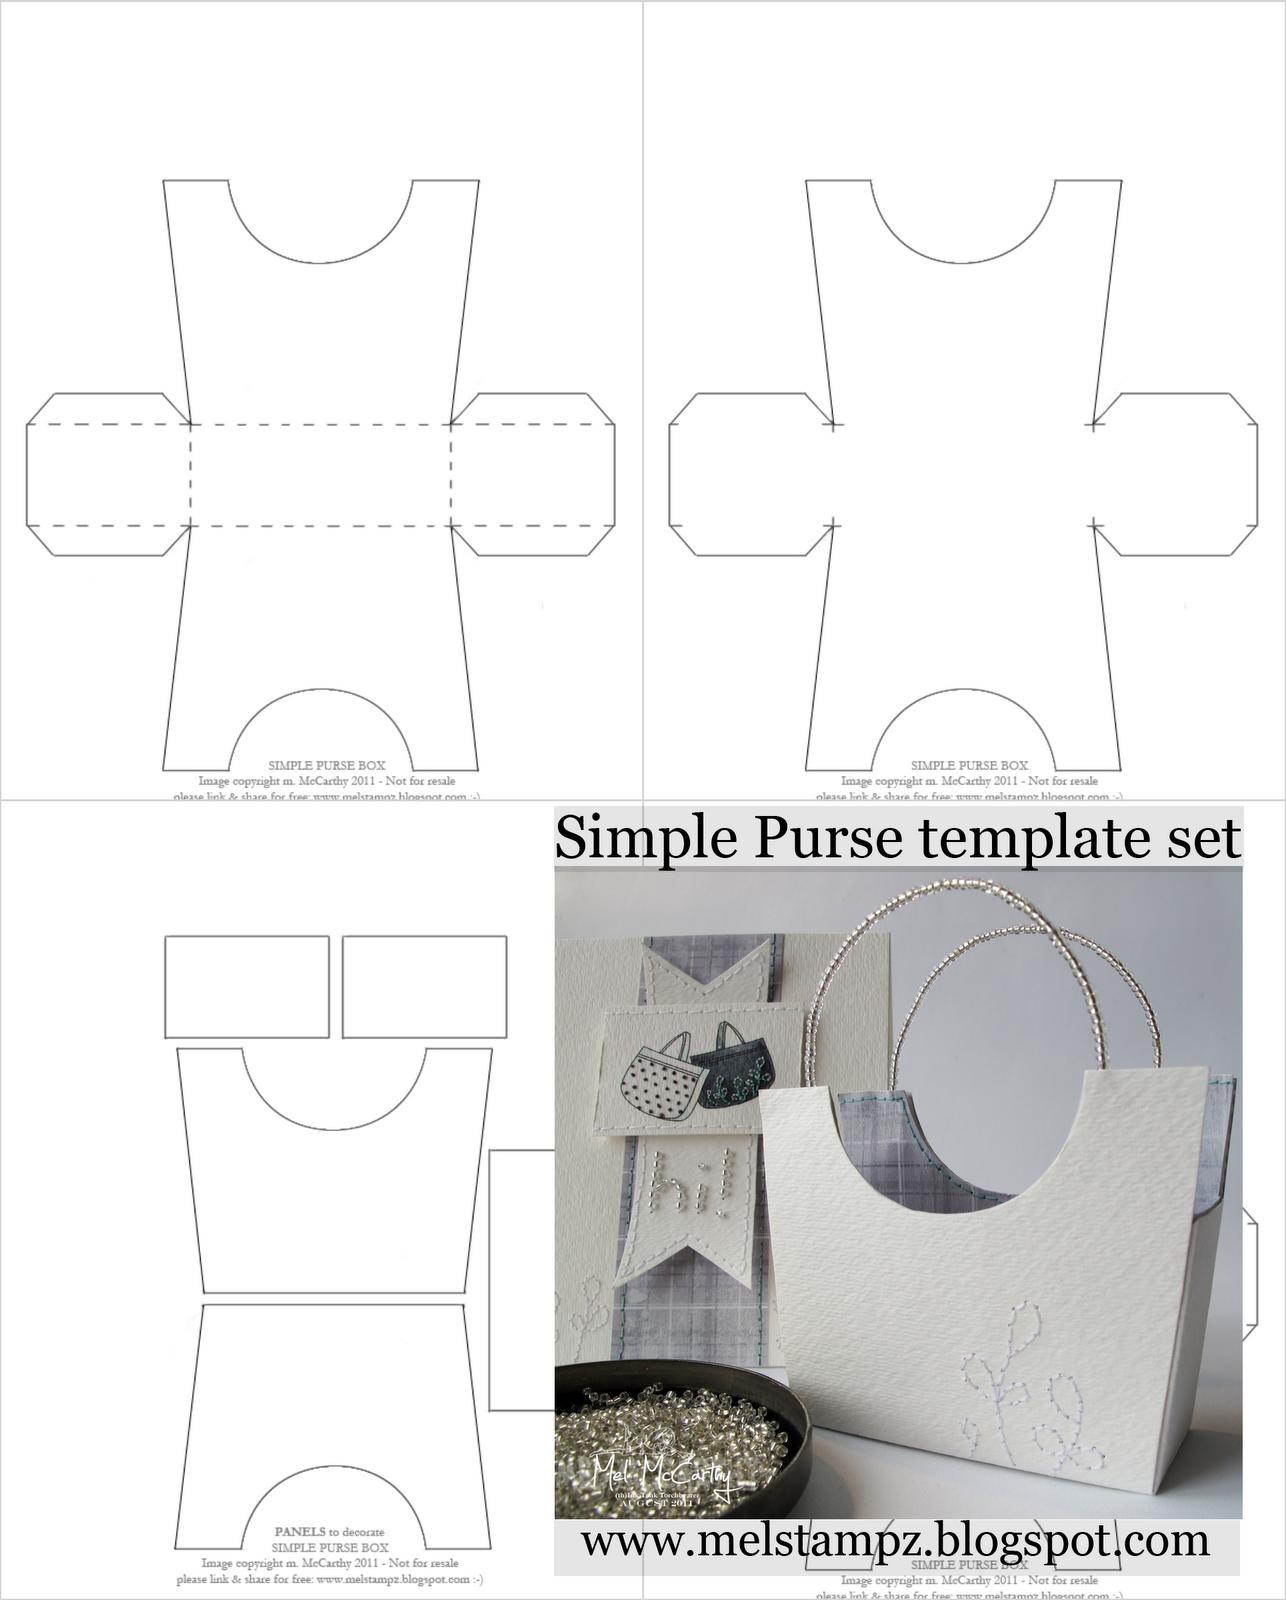 Mel Stampz: New simple purse box Templates